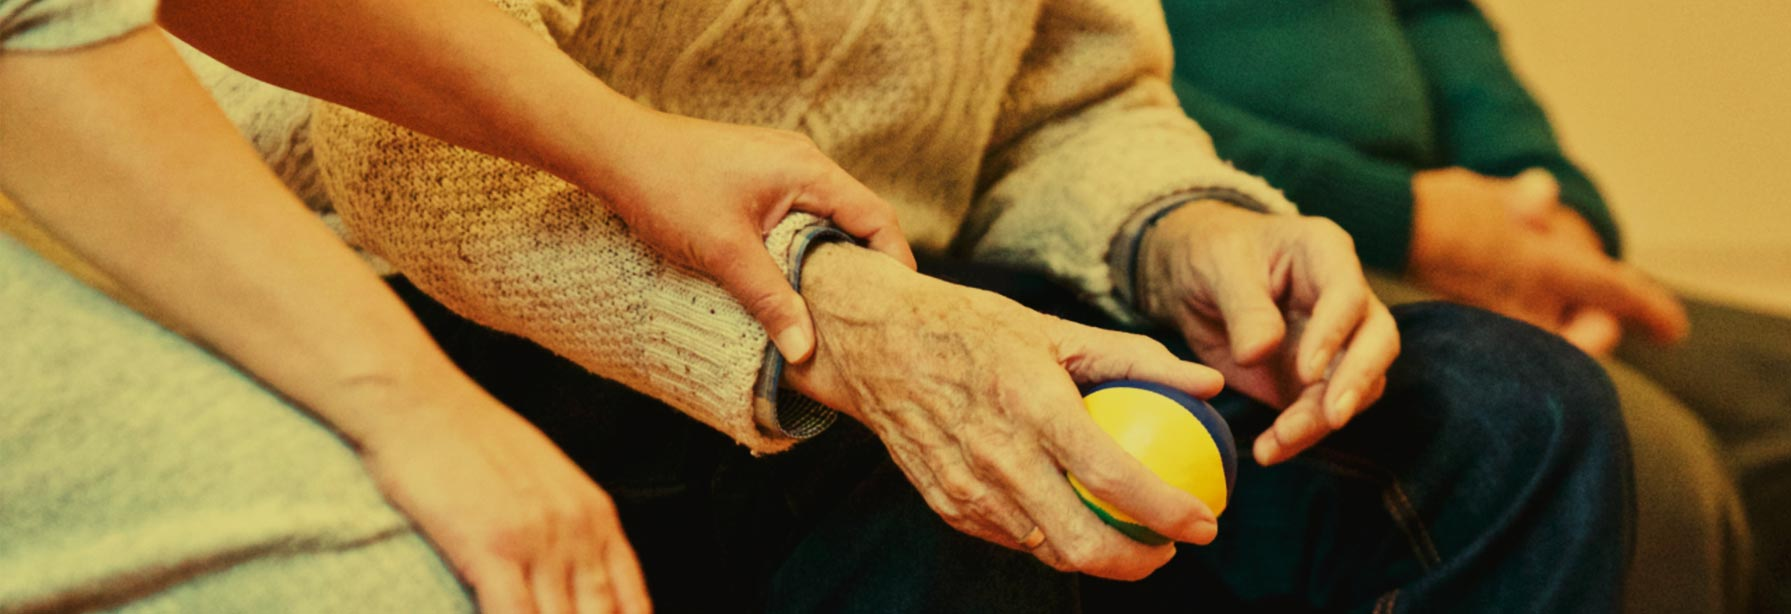 long-term-care